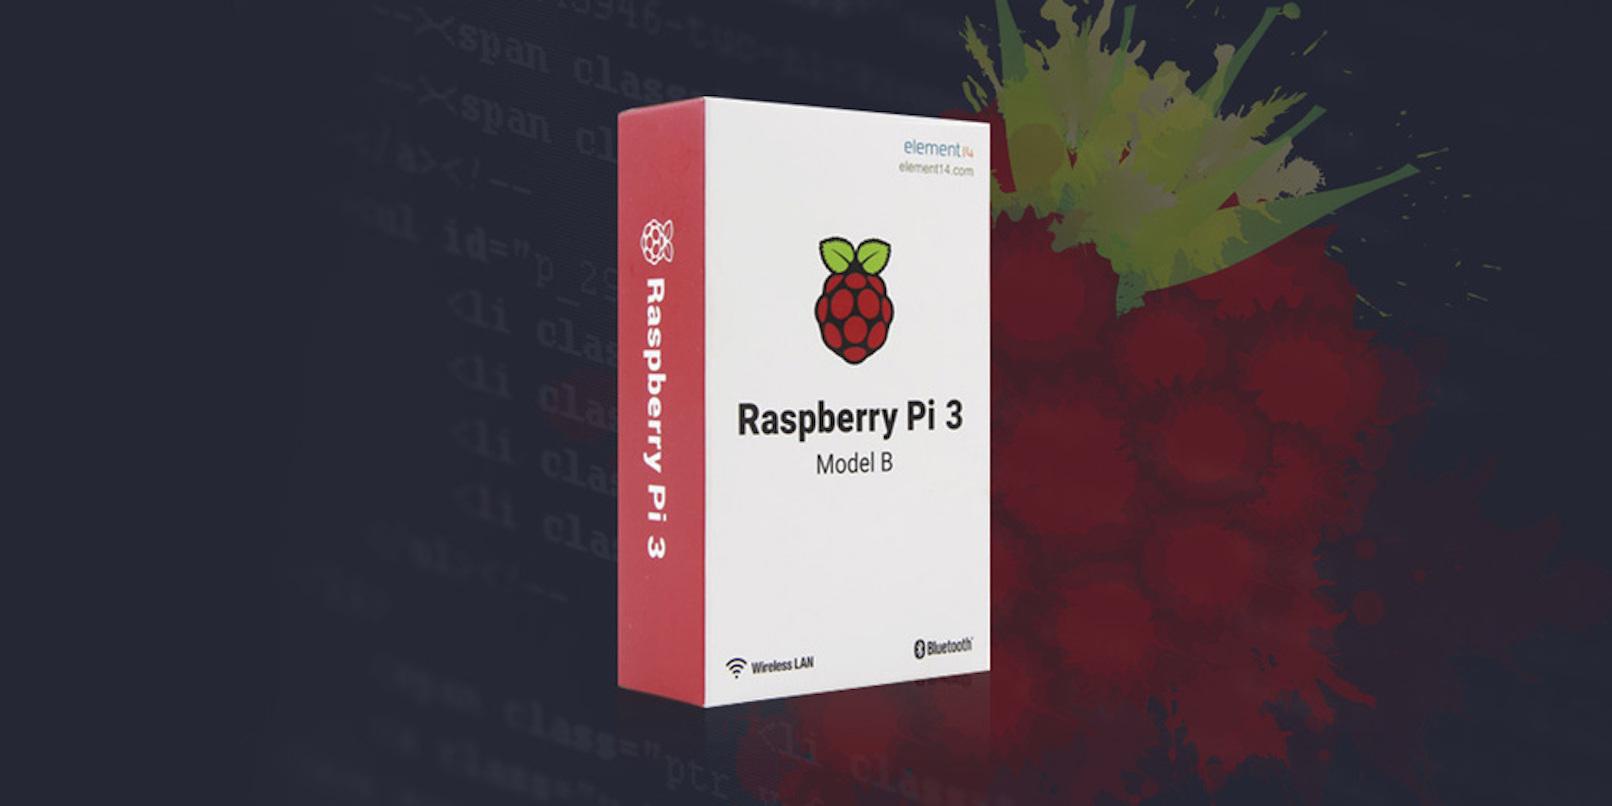 Master DIY robotics with The Complete Raspberry Pi 3 Starter Kit (55% Off)